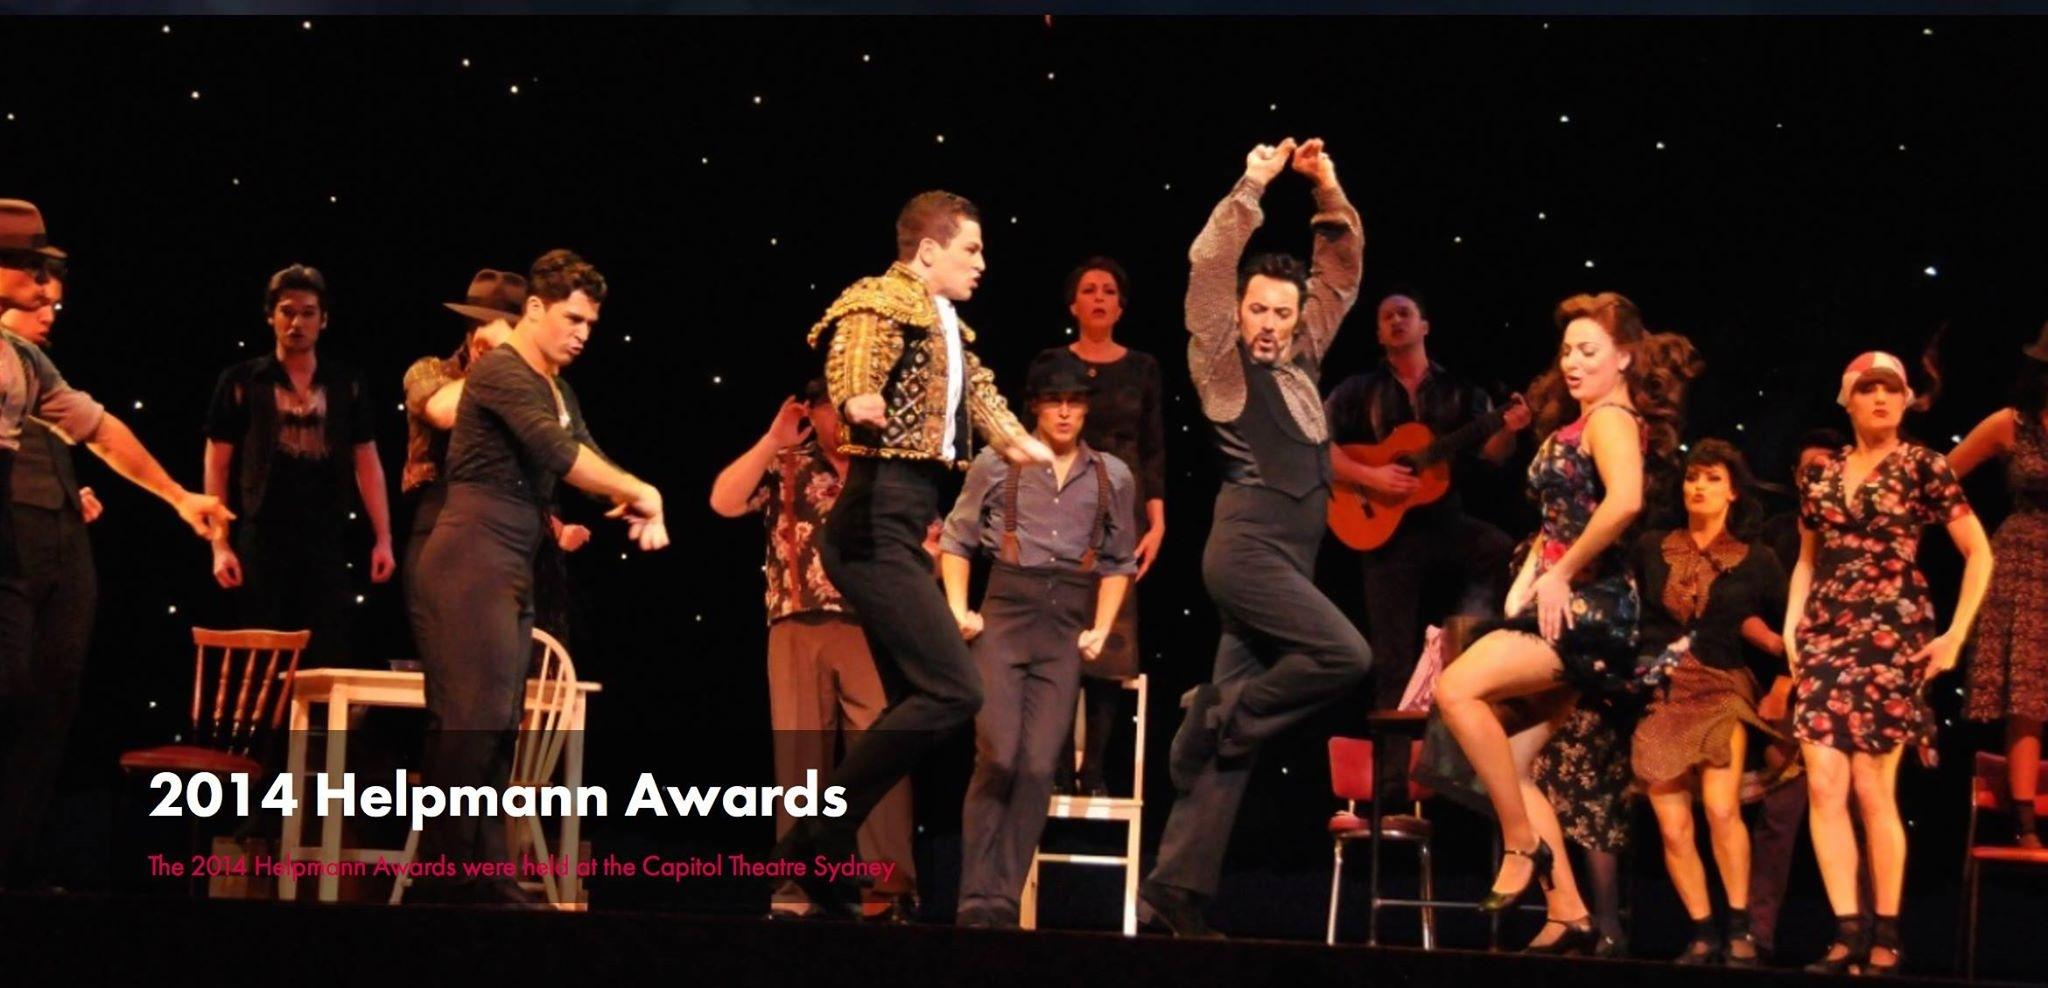 Strictly Ballroom Helpmann awards performance Sydney Australia 2014